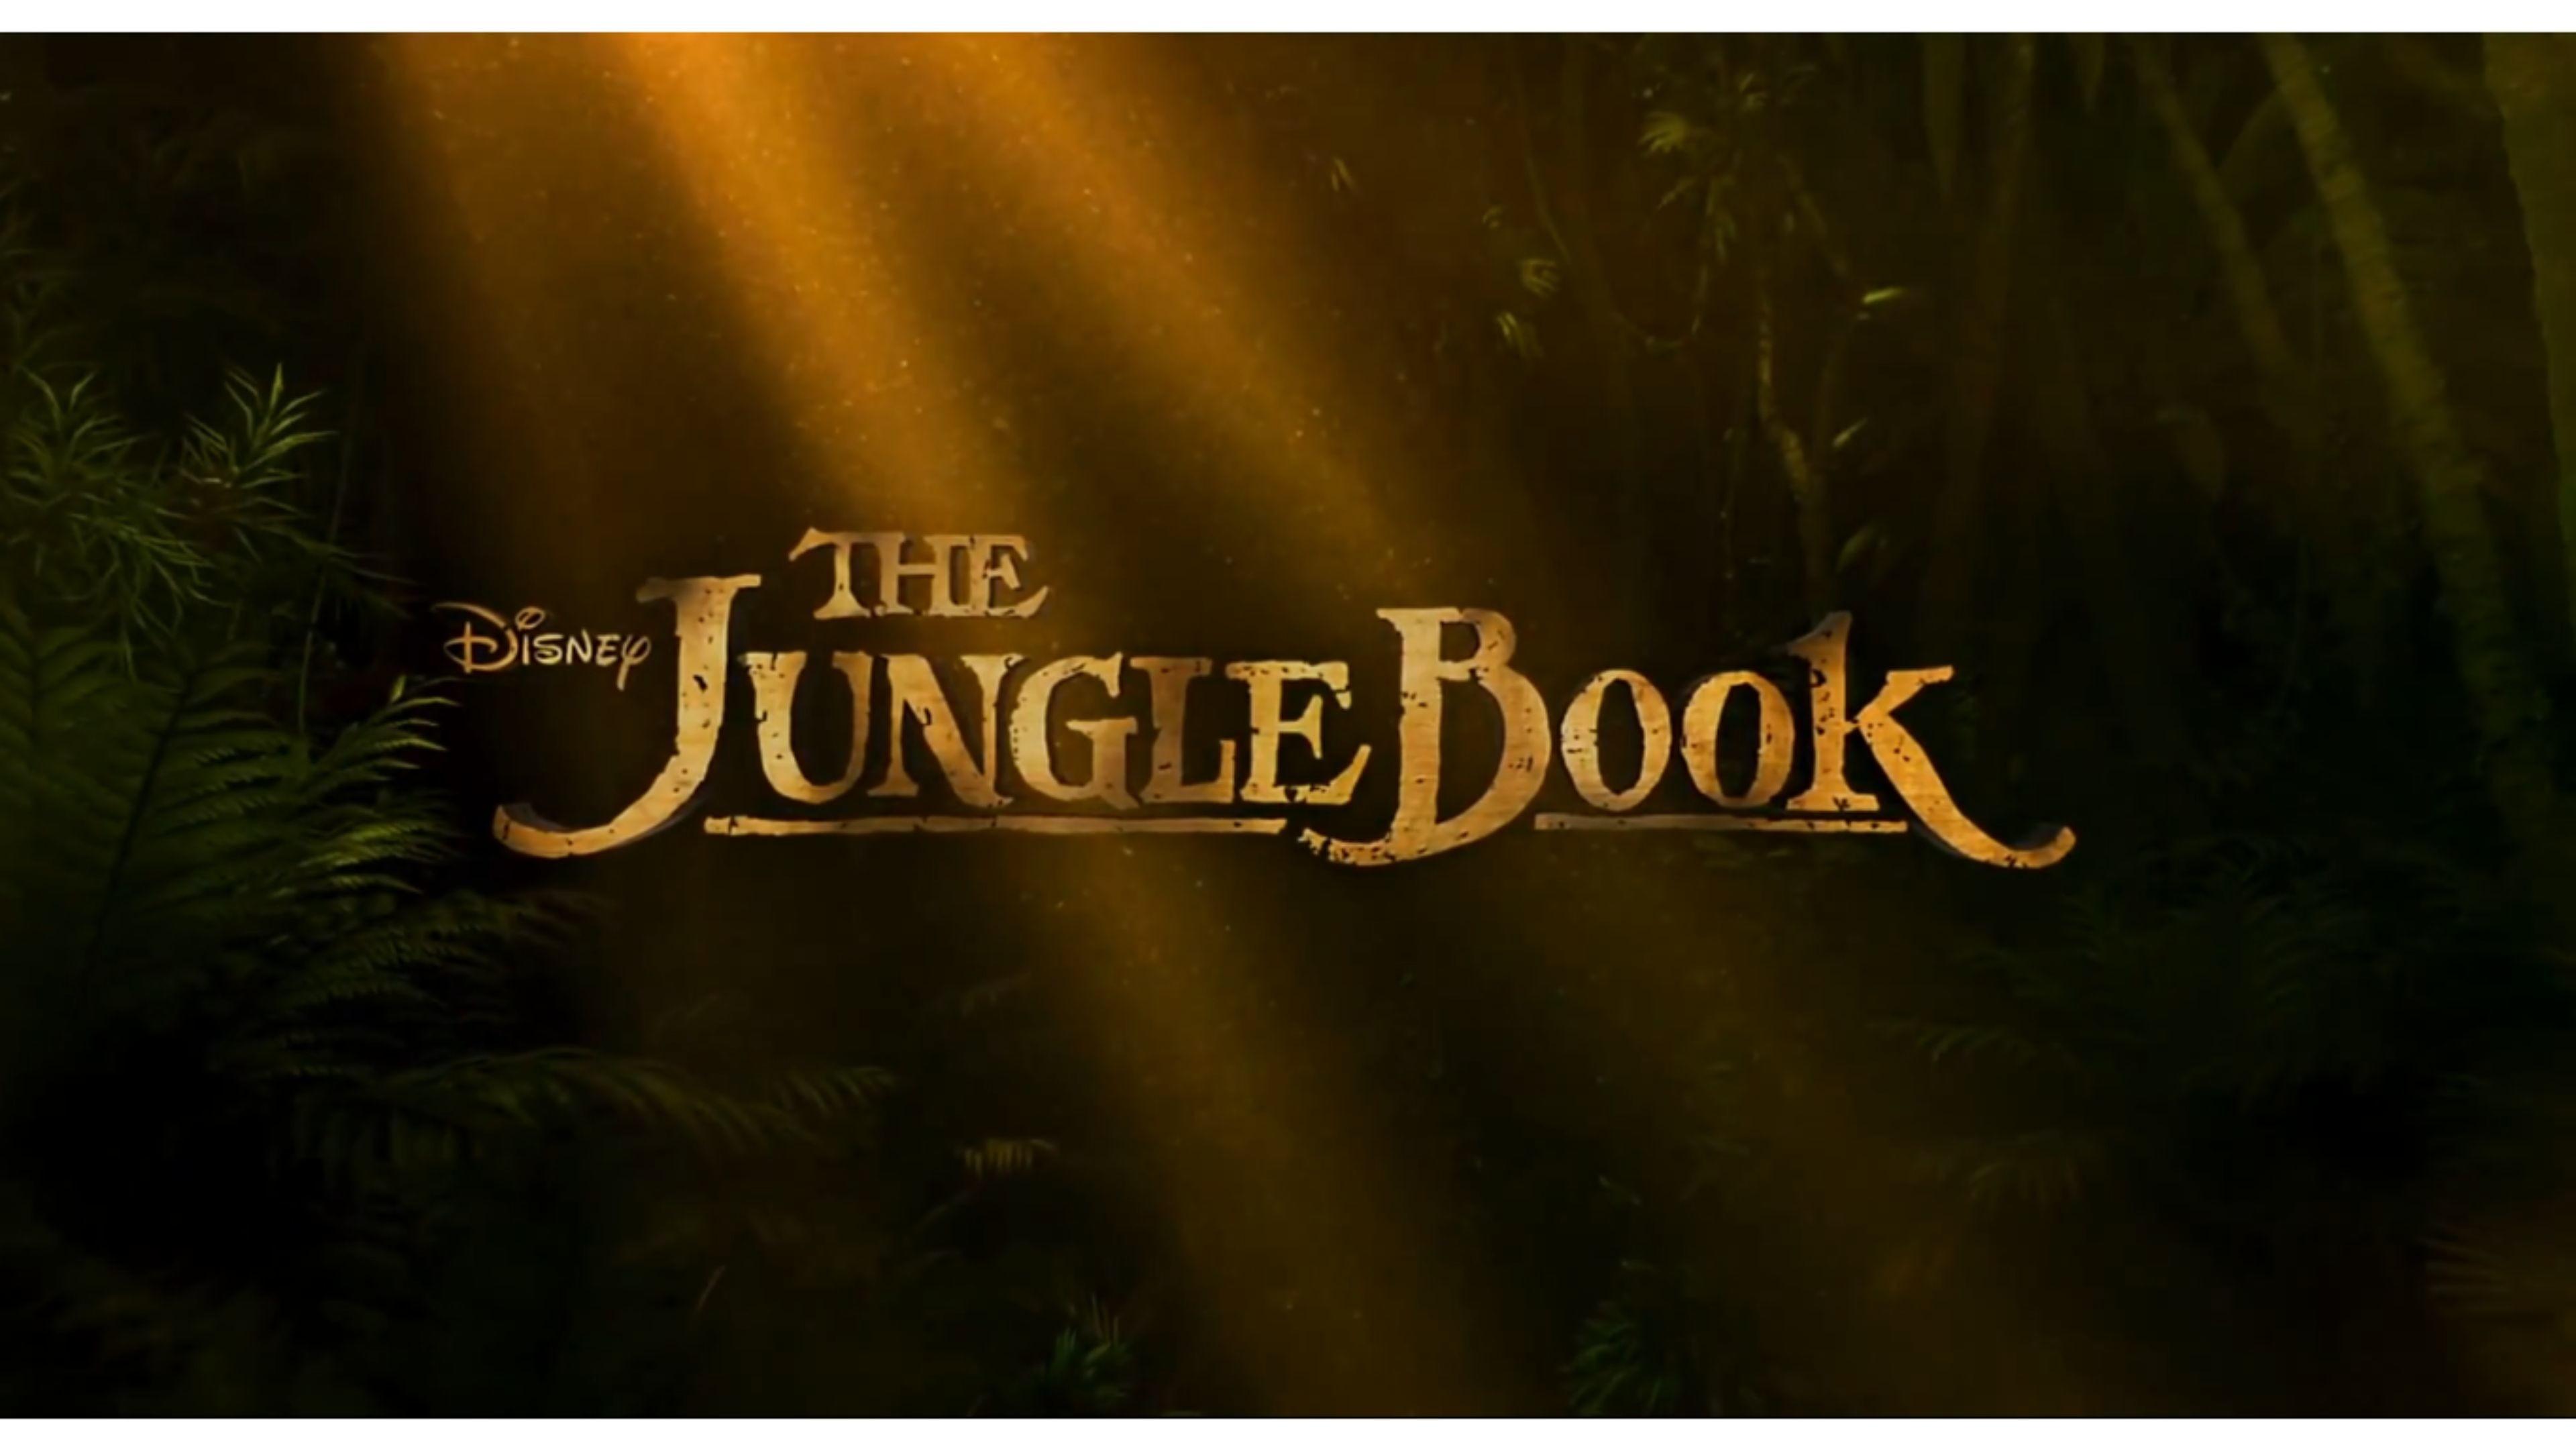 Disney 4K 2016 Jungle Book Movie Wallpapers | Free 4K Wallpaper